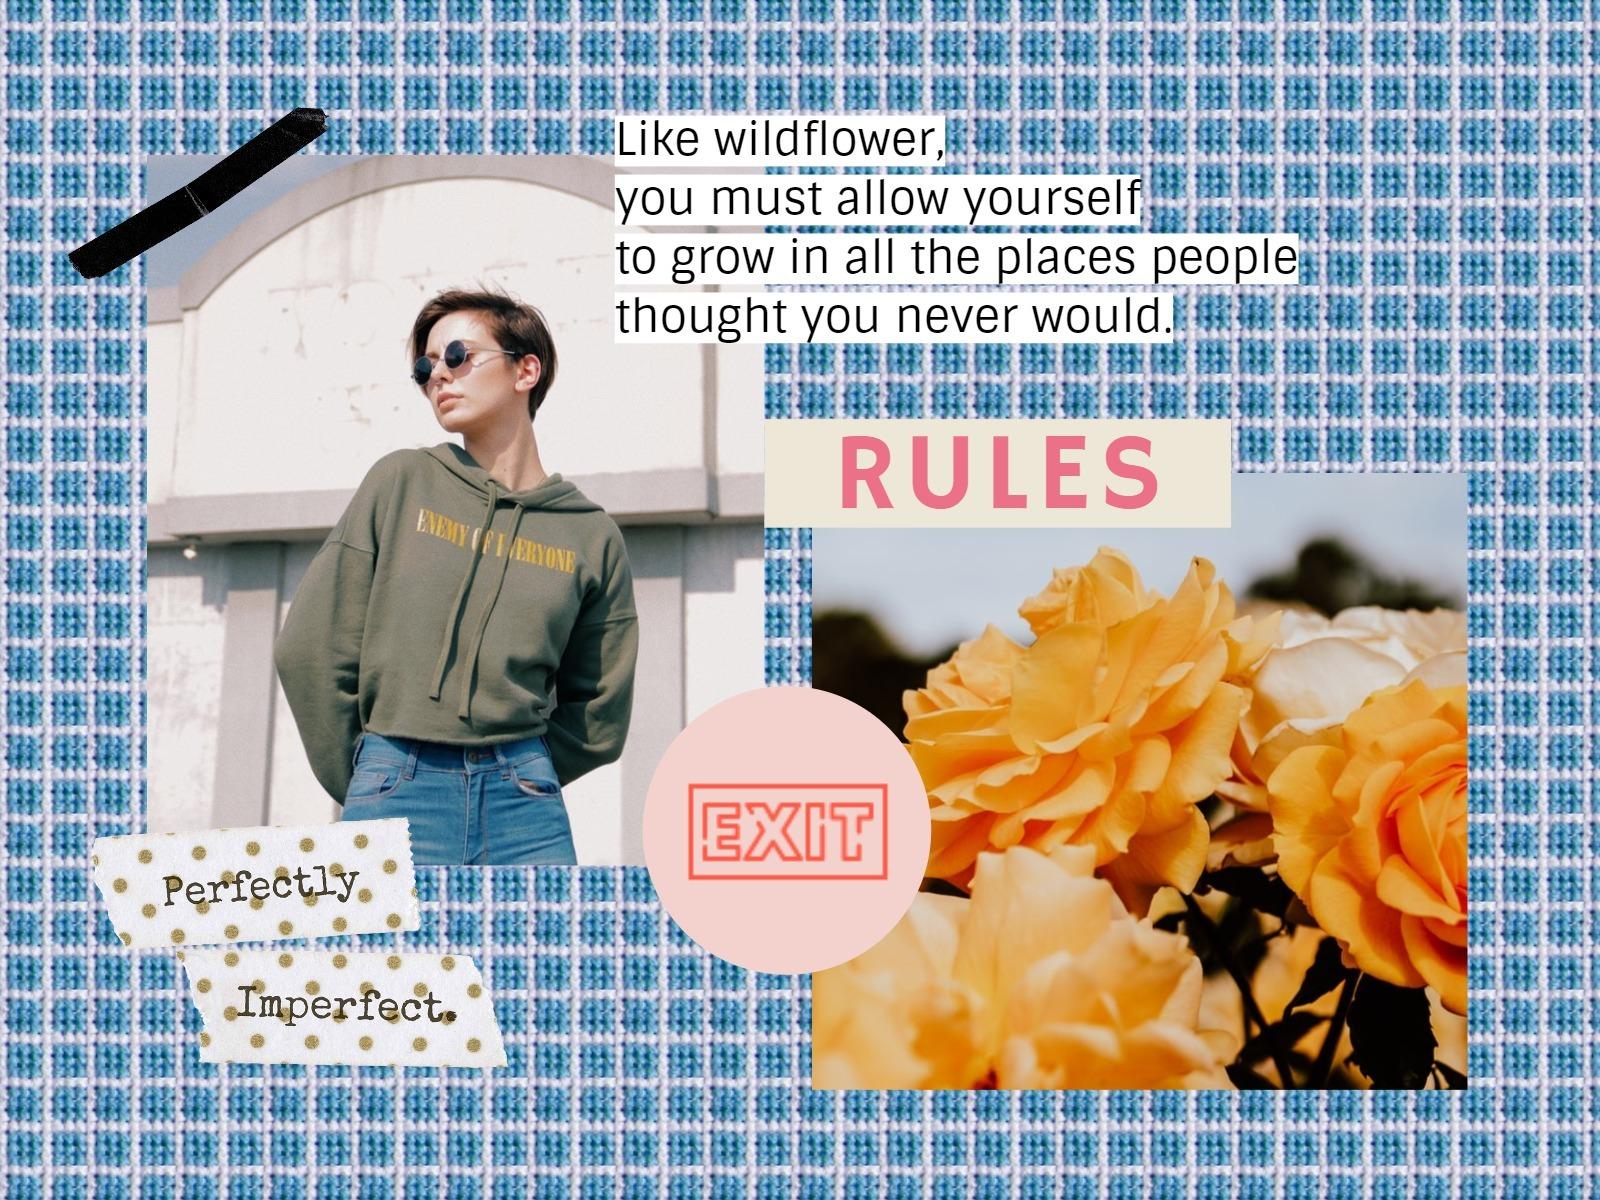 rules4x3_wl_20190704